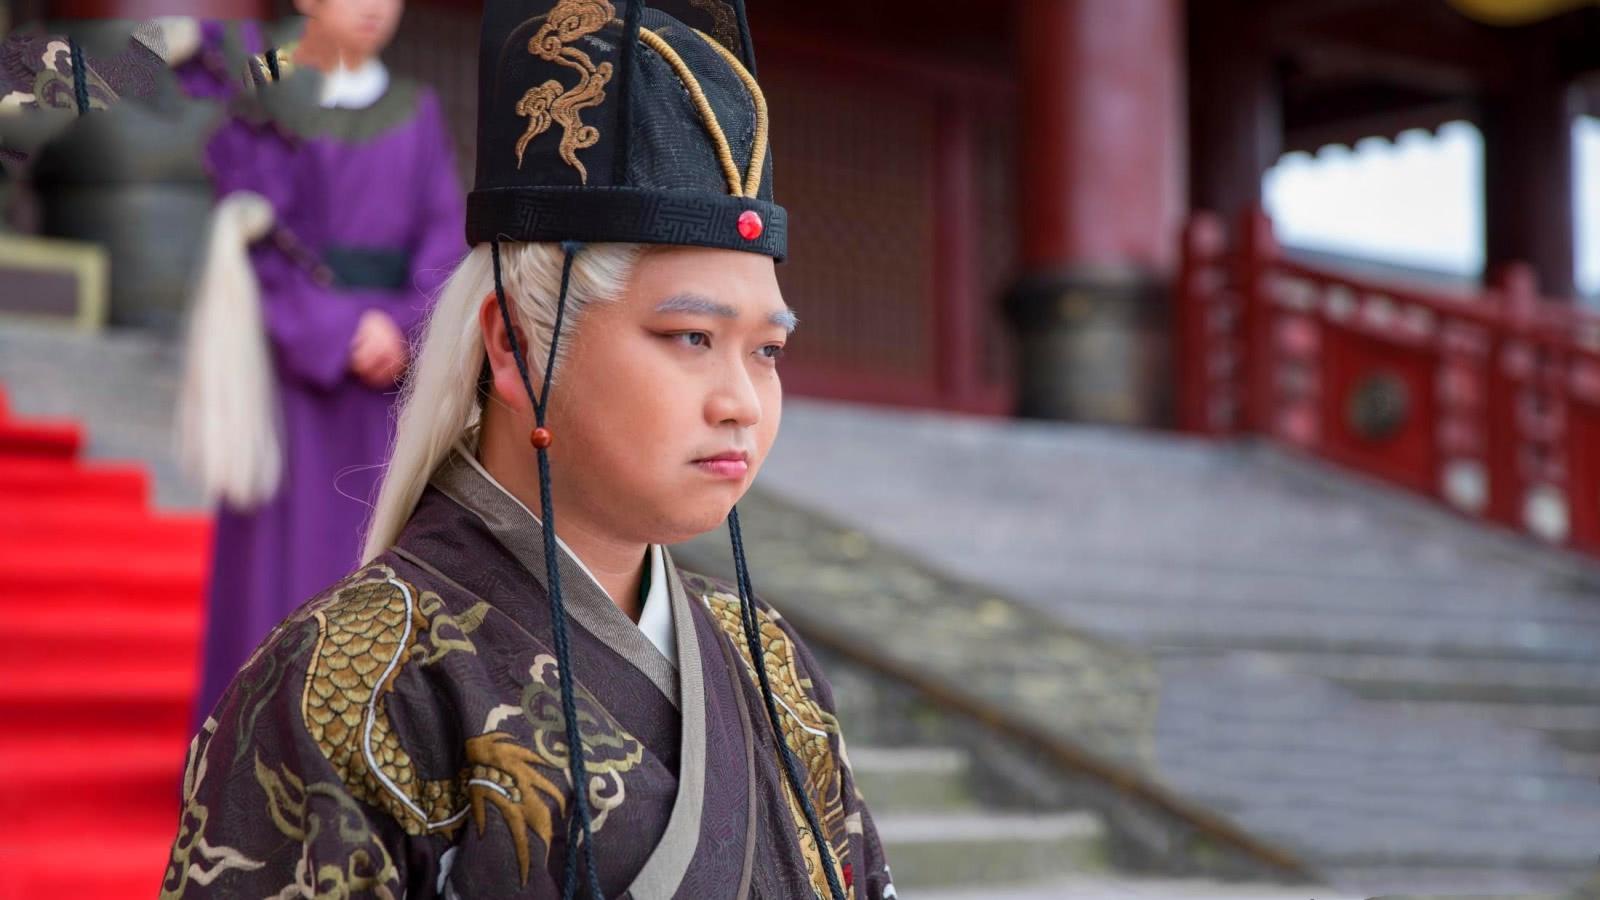 Ha Van Huy - chang ngo phim Chau Tinh Tri tro thanh trieu phu hinh anh 4 ha_van_huy6.jpeg